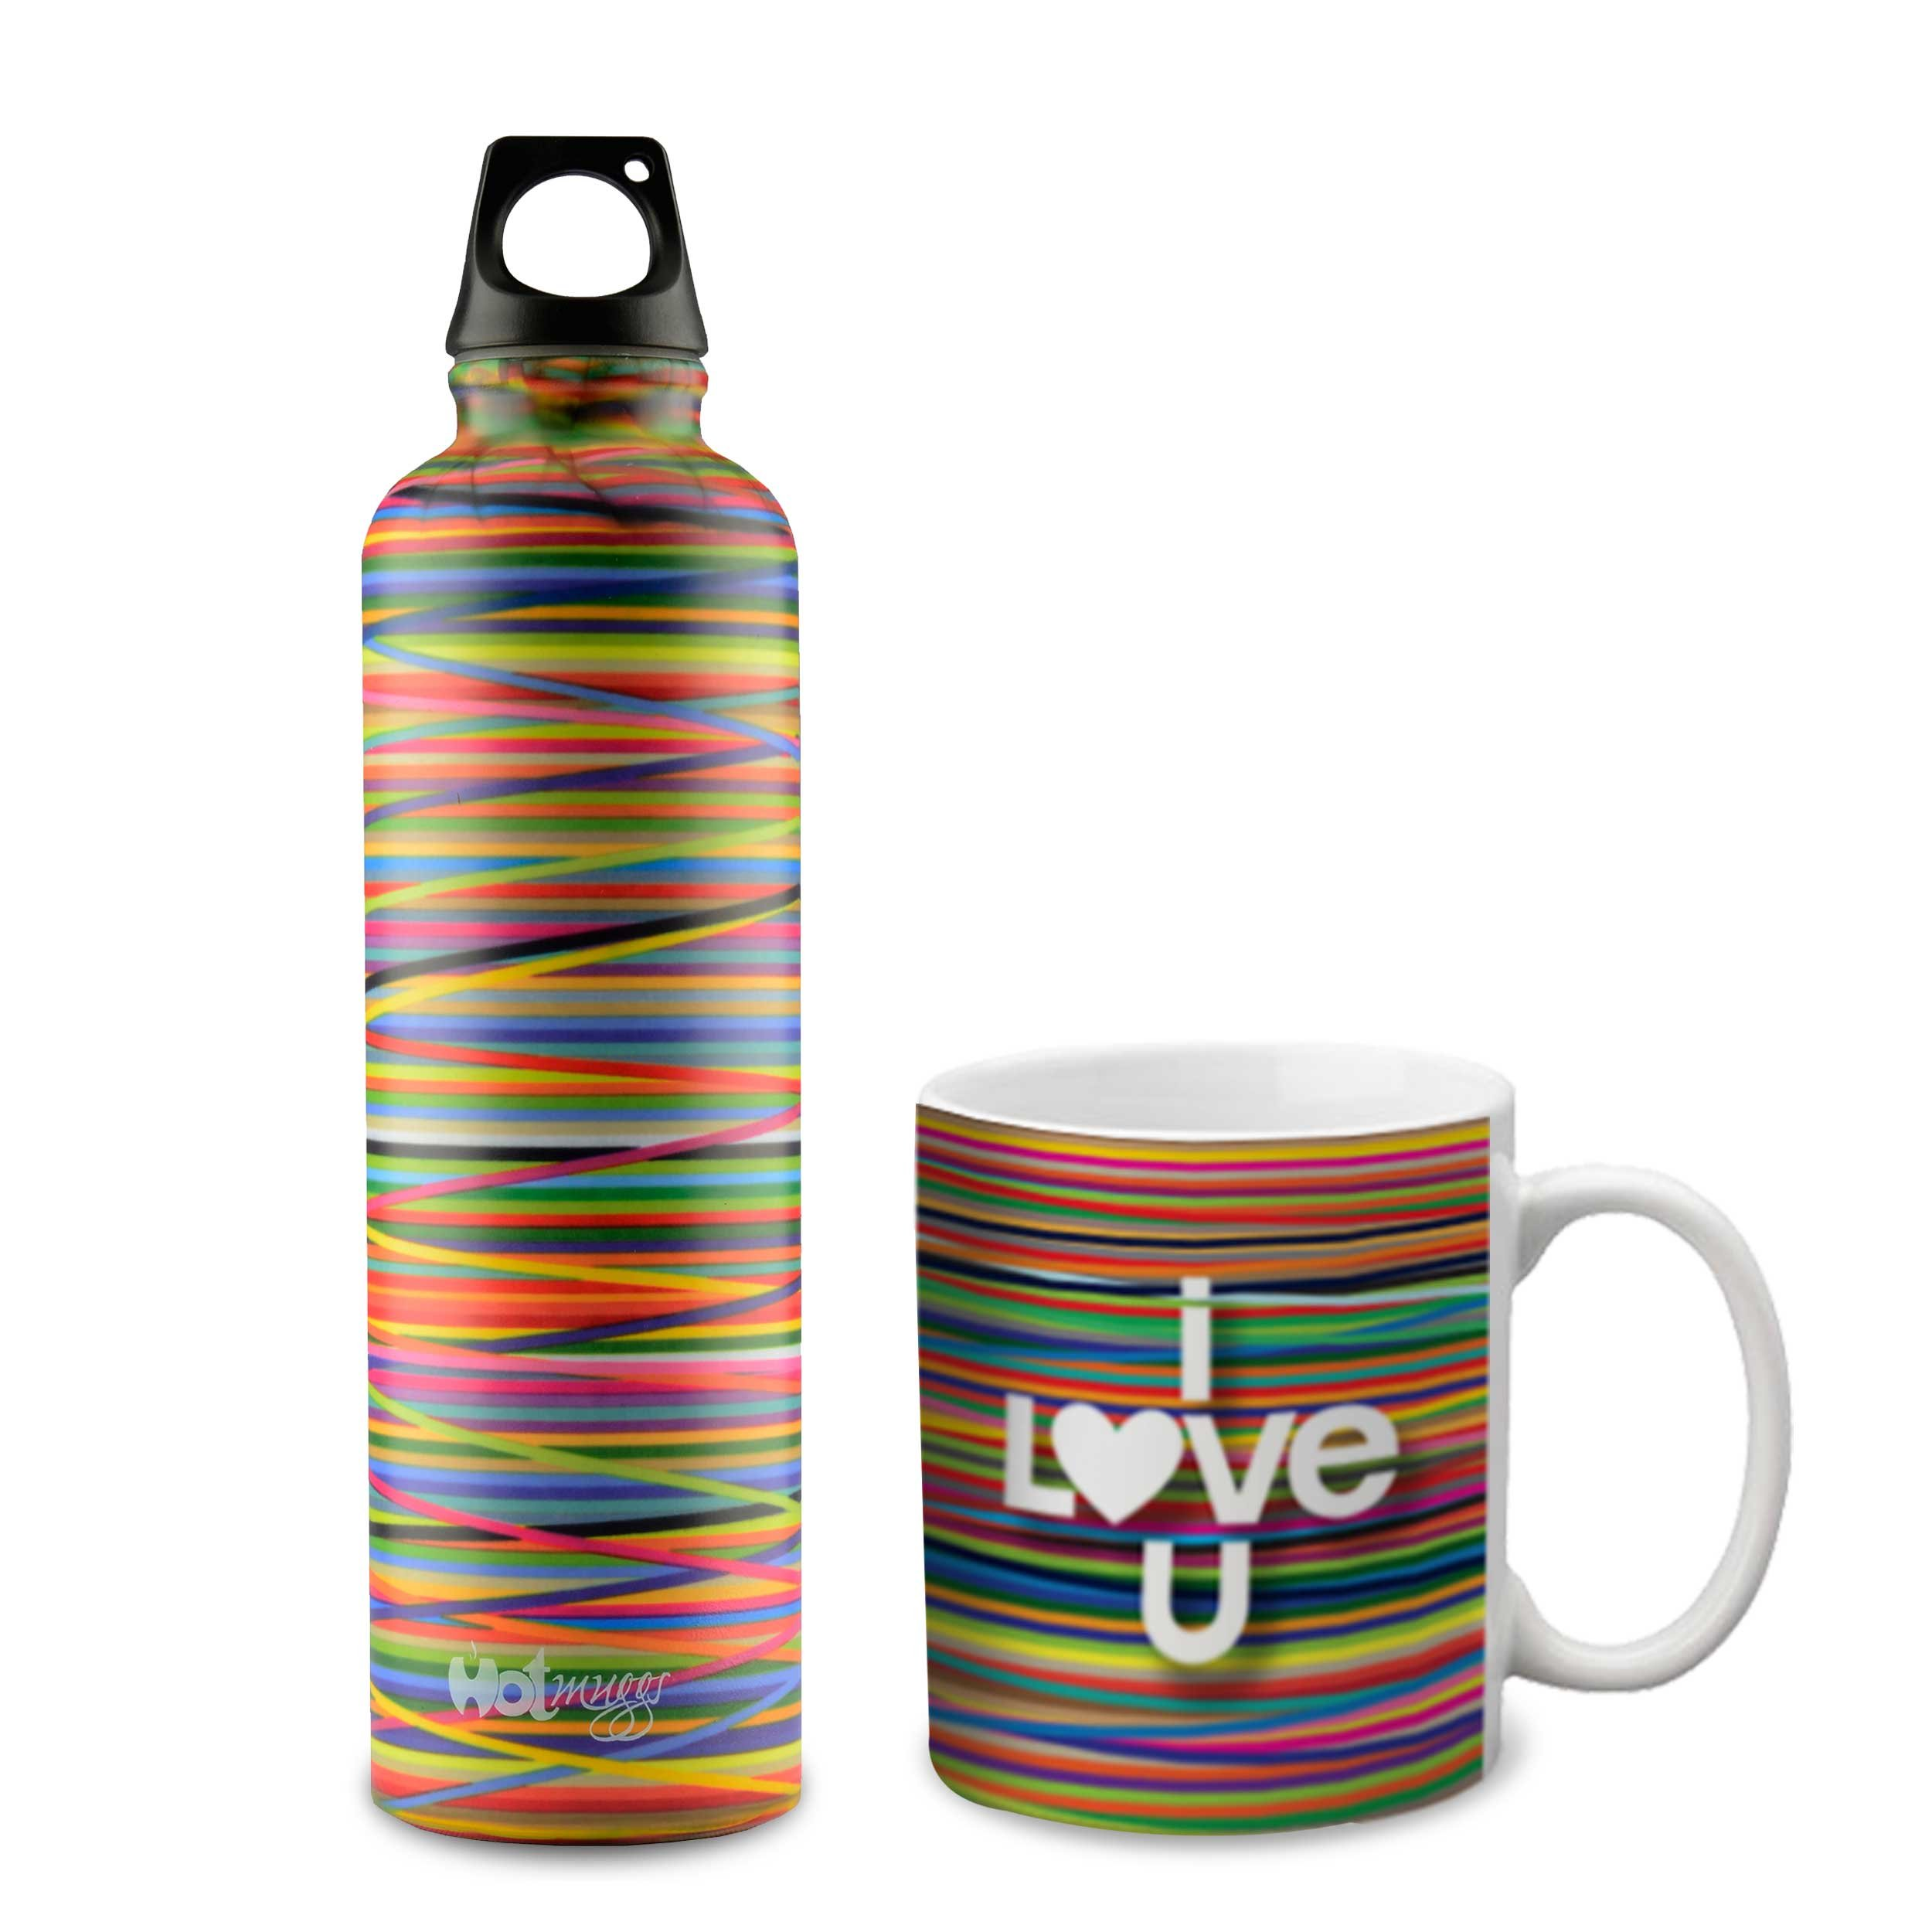 Hot Muggs Colors Combo Gift Set (I Love You Mug and Bottle), 2 Pc